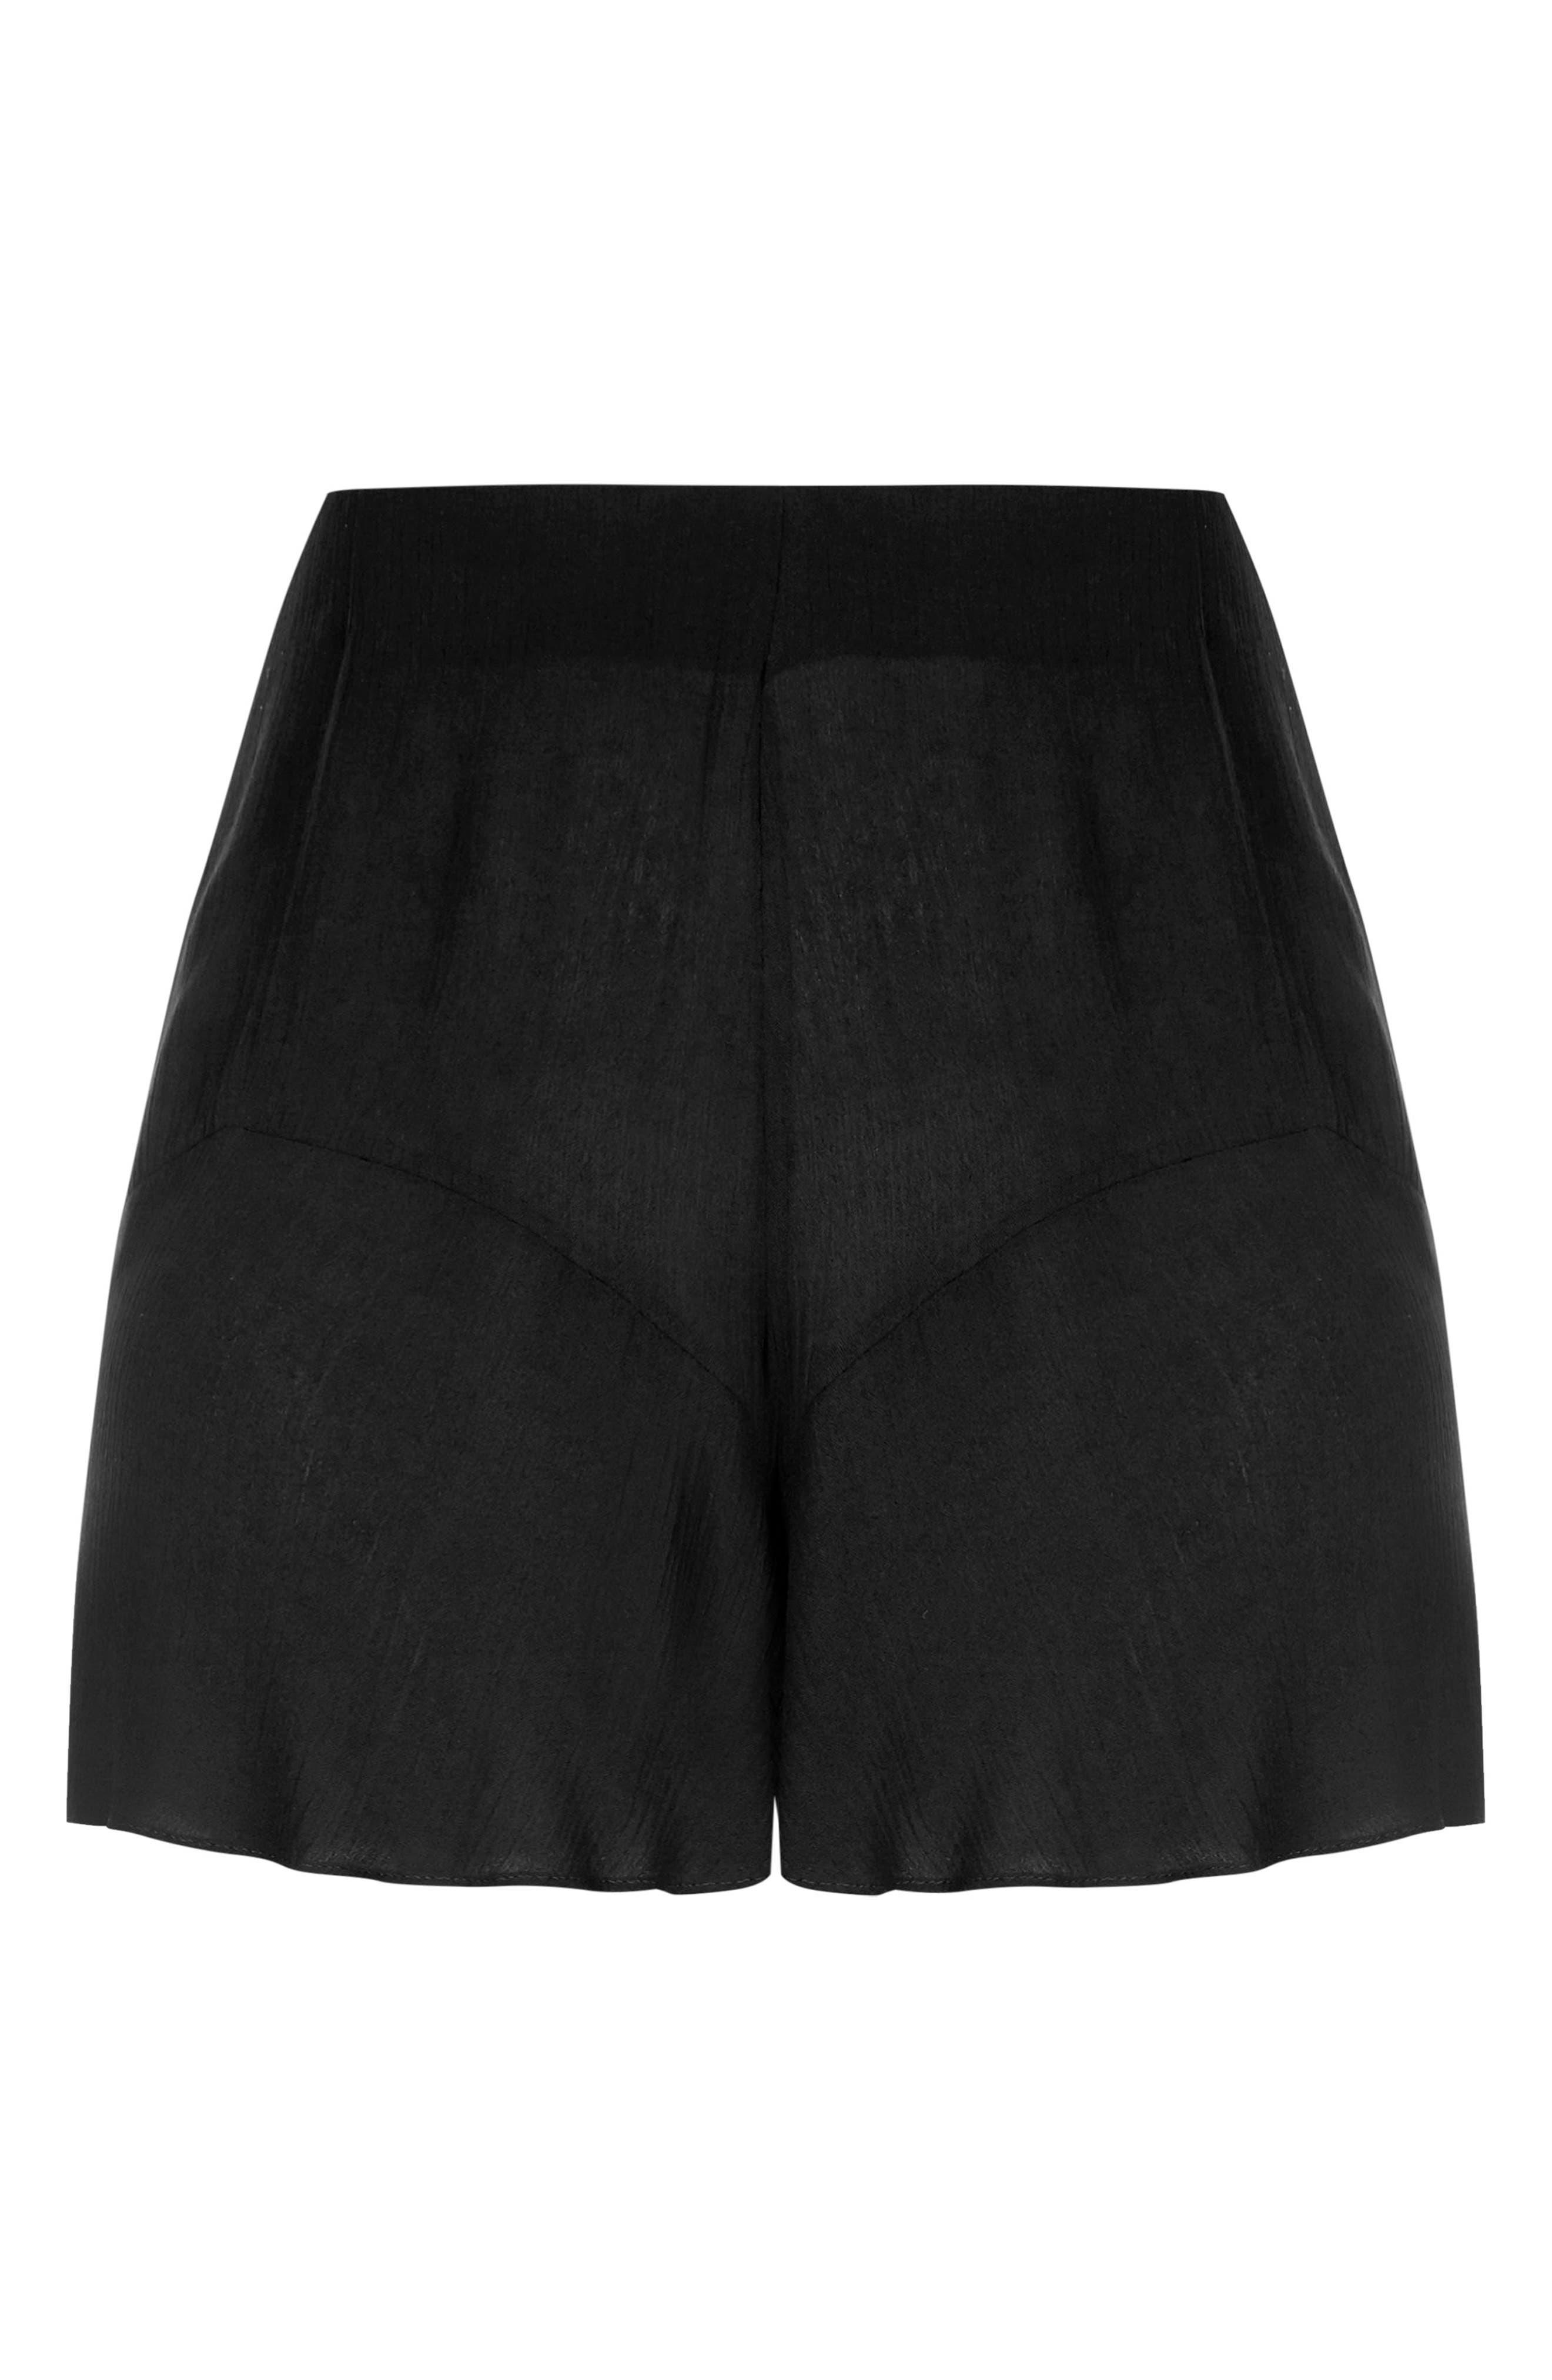 Sweet Frill Shorts,                             Alternate thumbnail 3, color,                             005